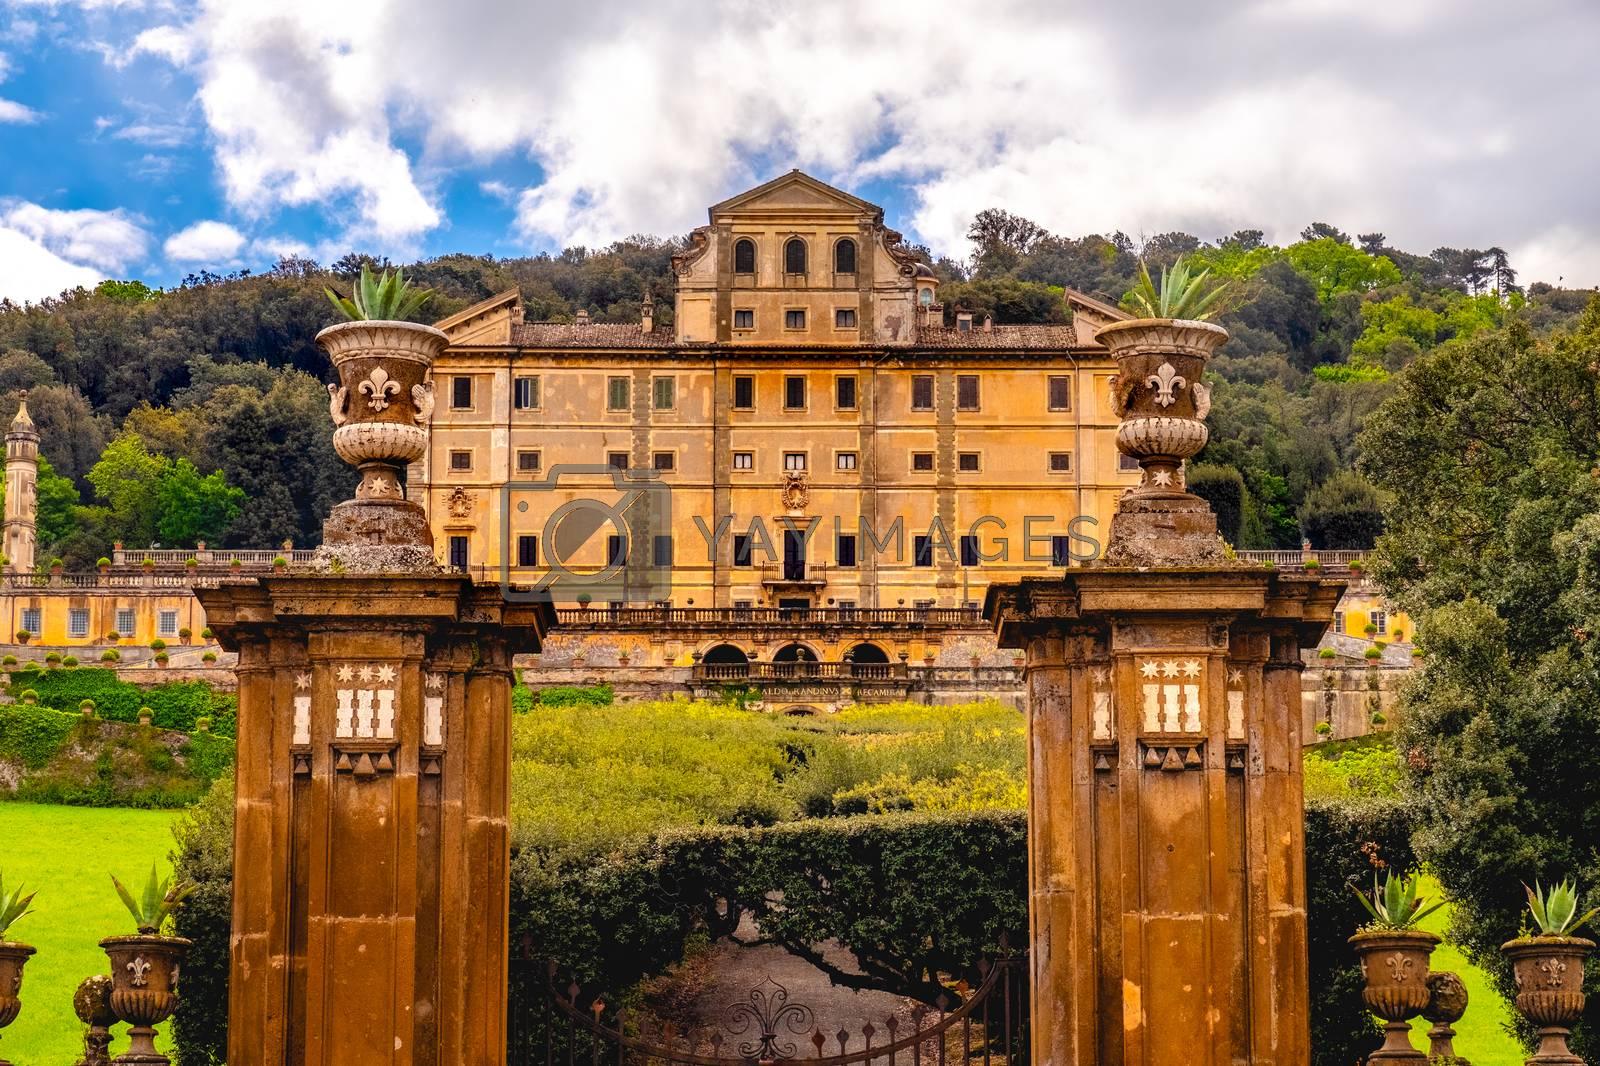 Frascati - Lazio - Italy historic landmark Aldobrandini palace near Rome by Luca Lorenzelli